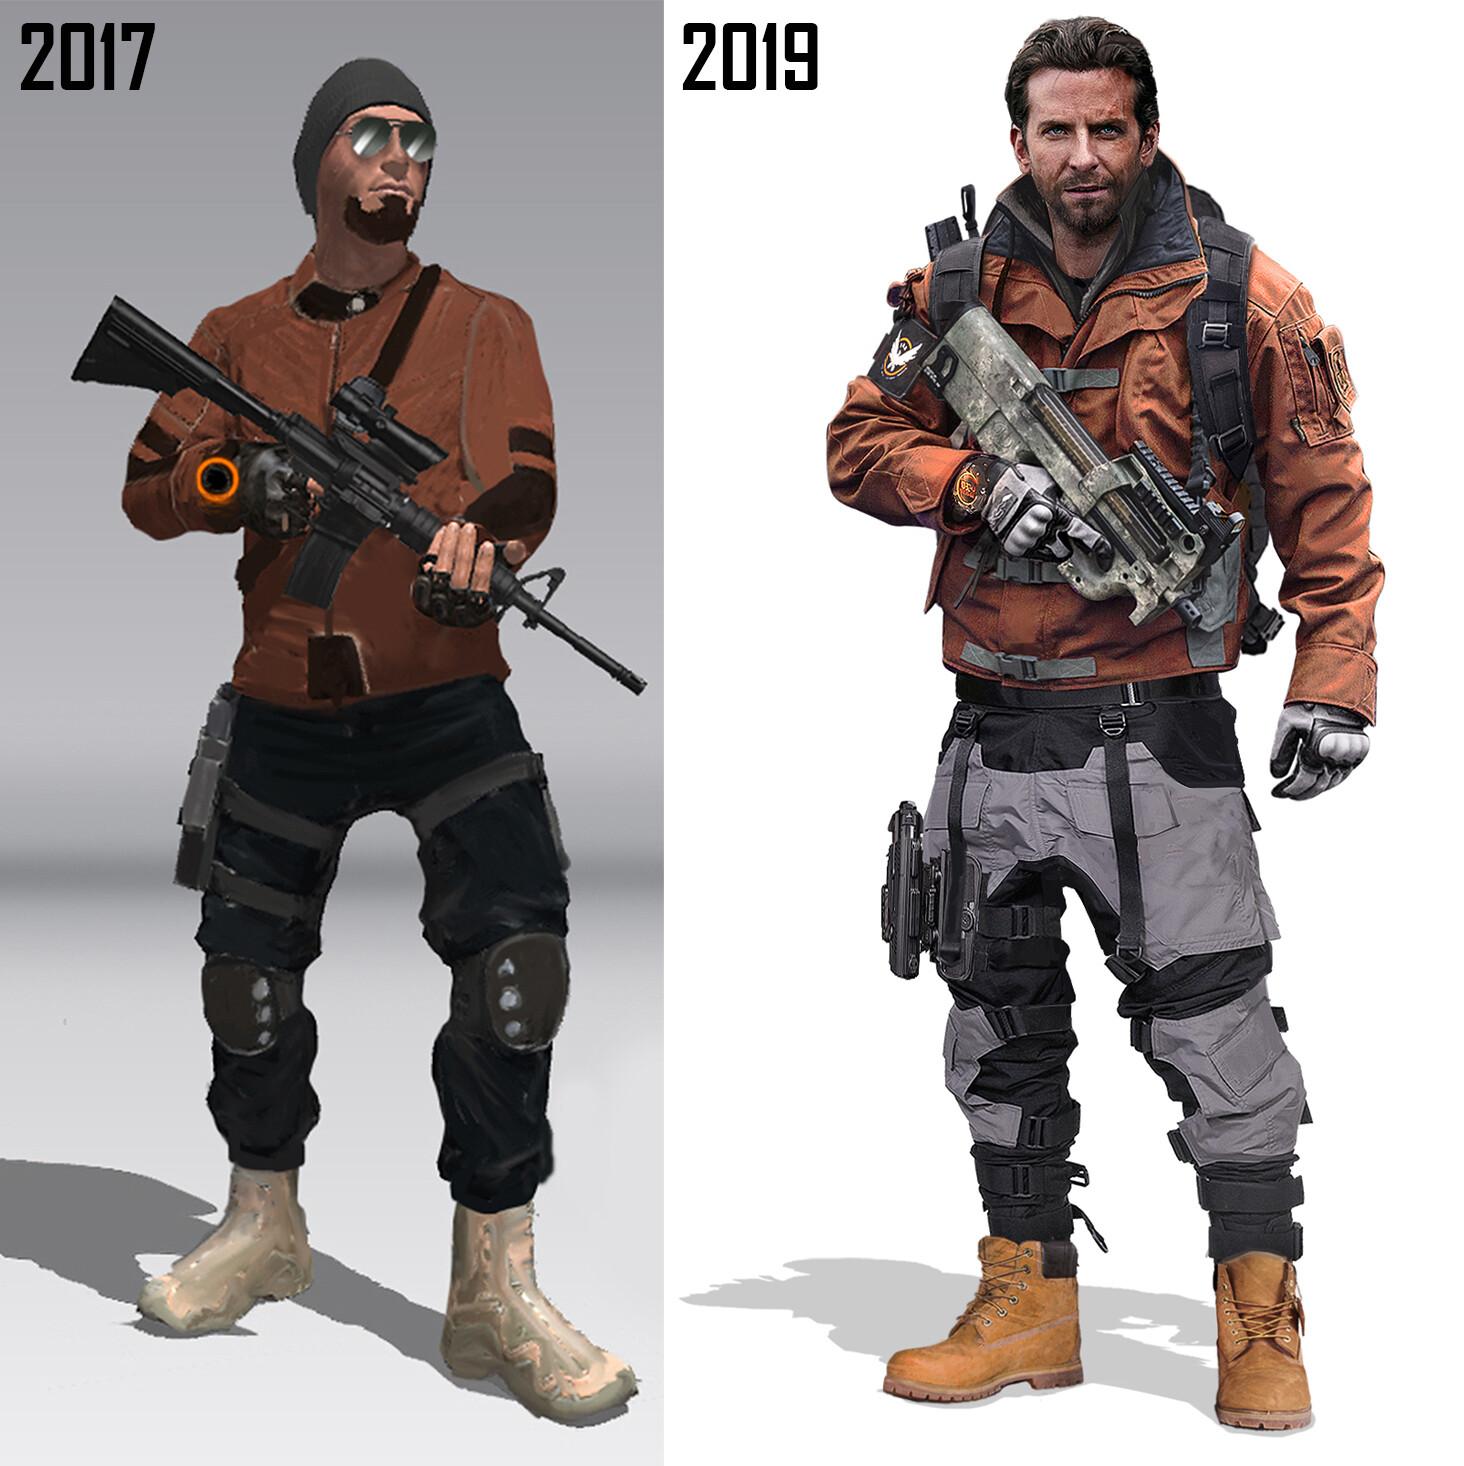 2017 vs 2019